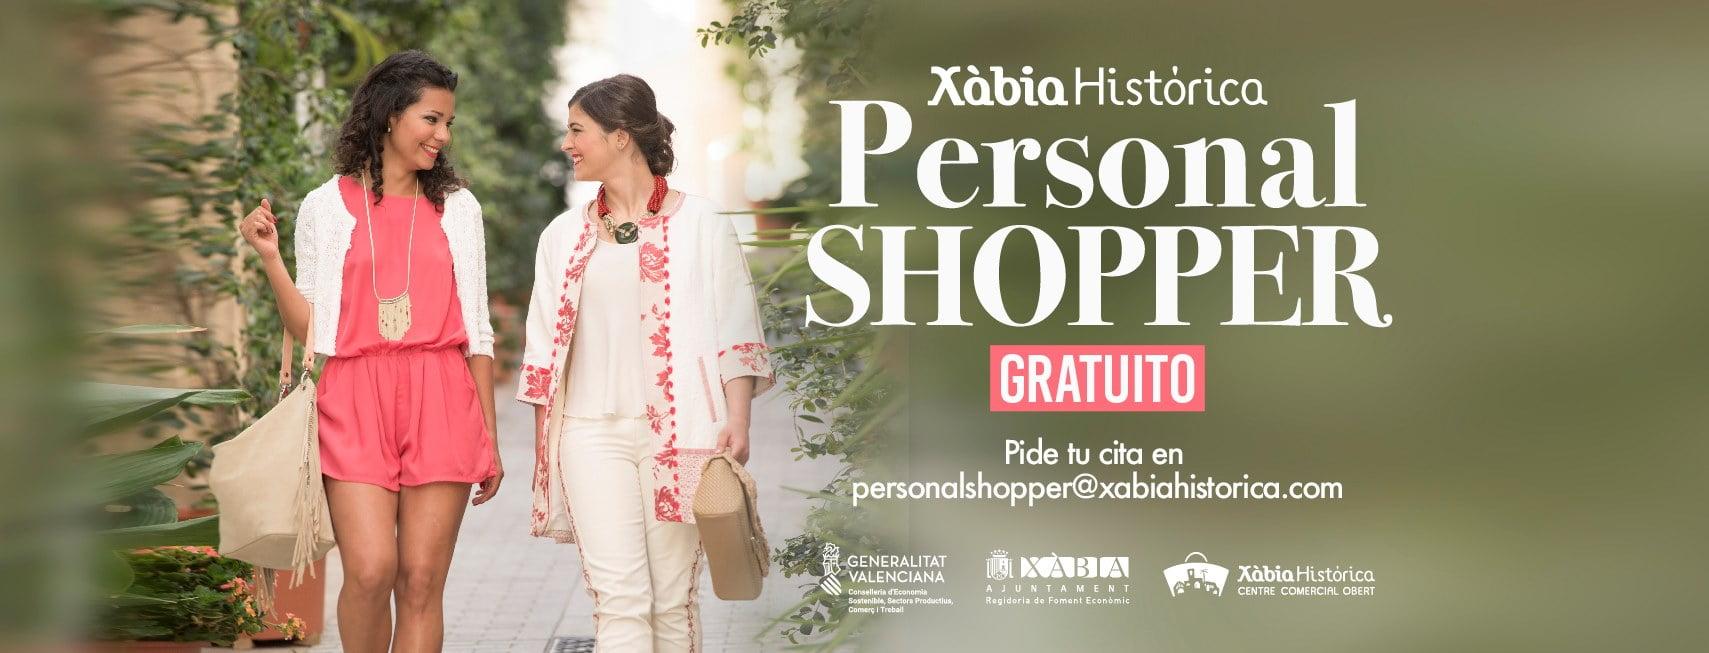 Servicio de Personal Shopper en Xàbia Histórica